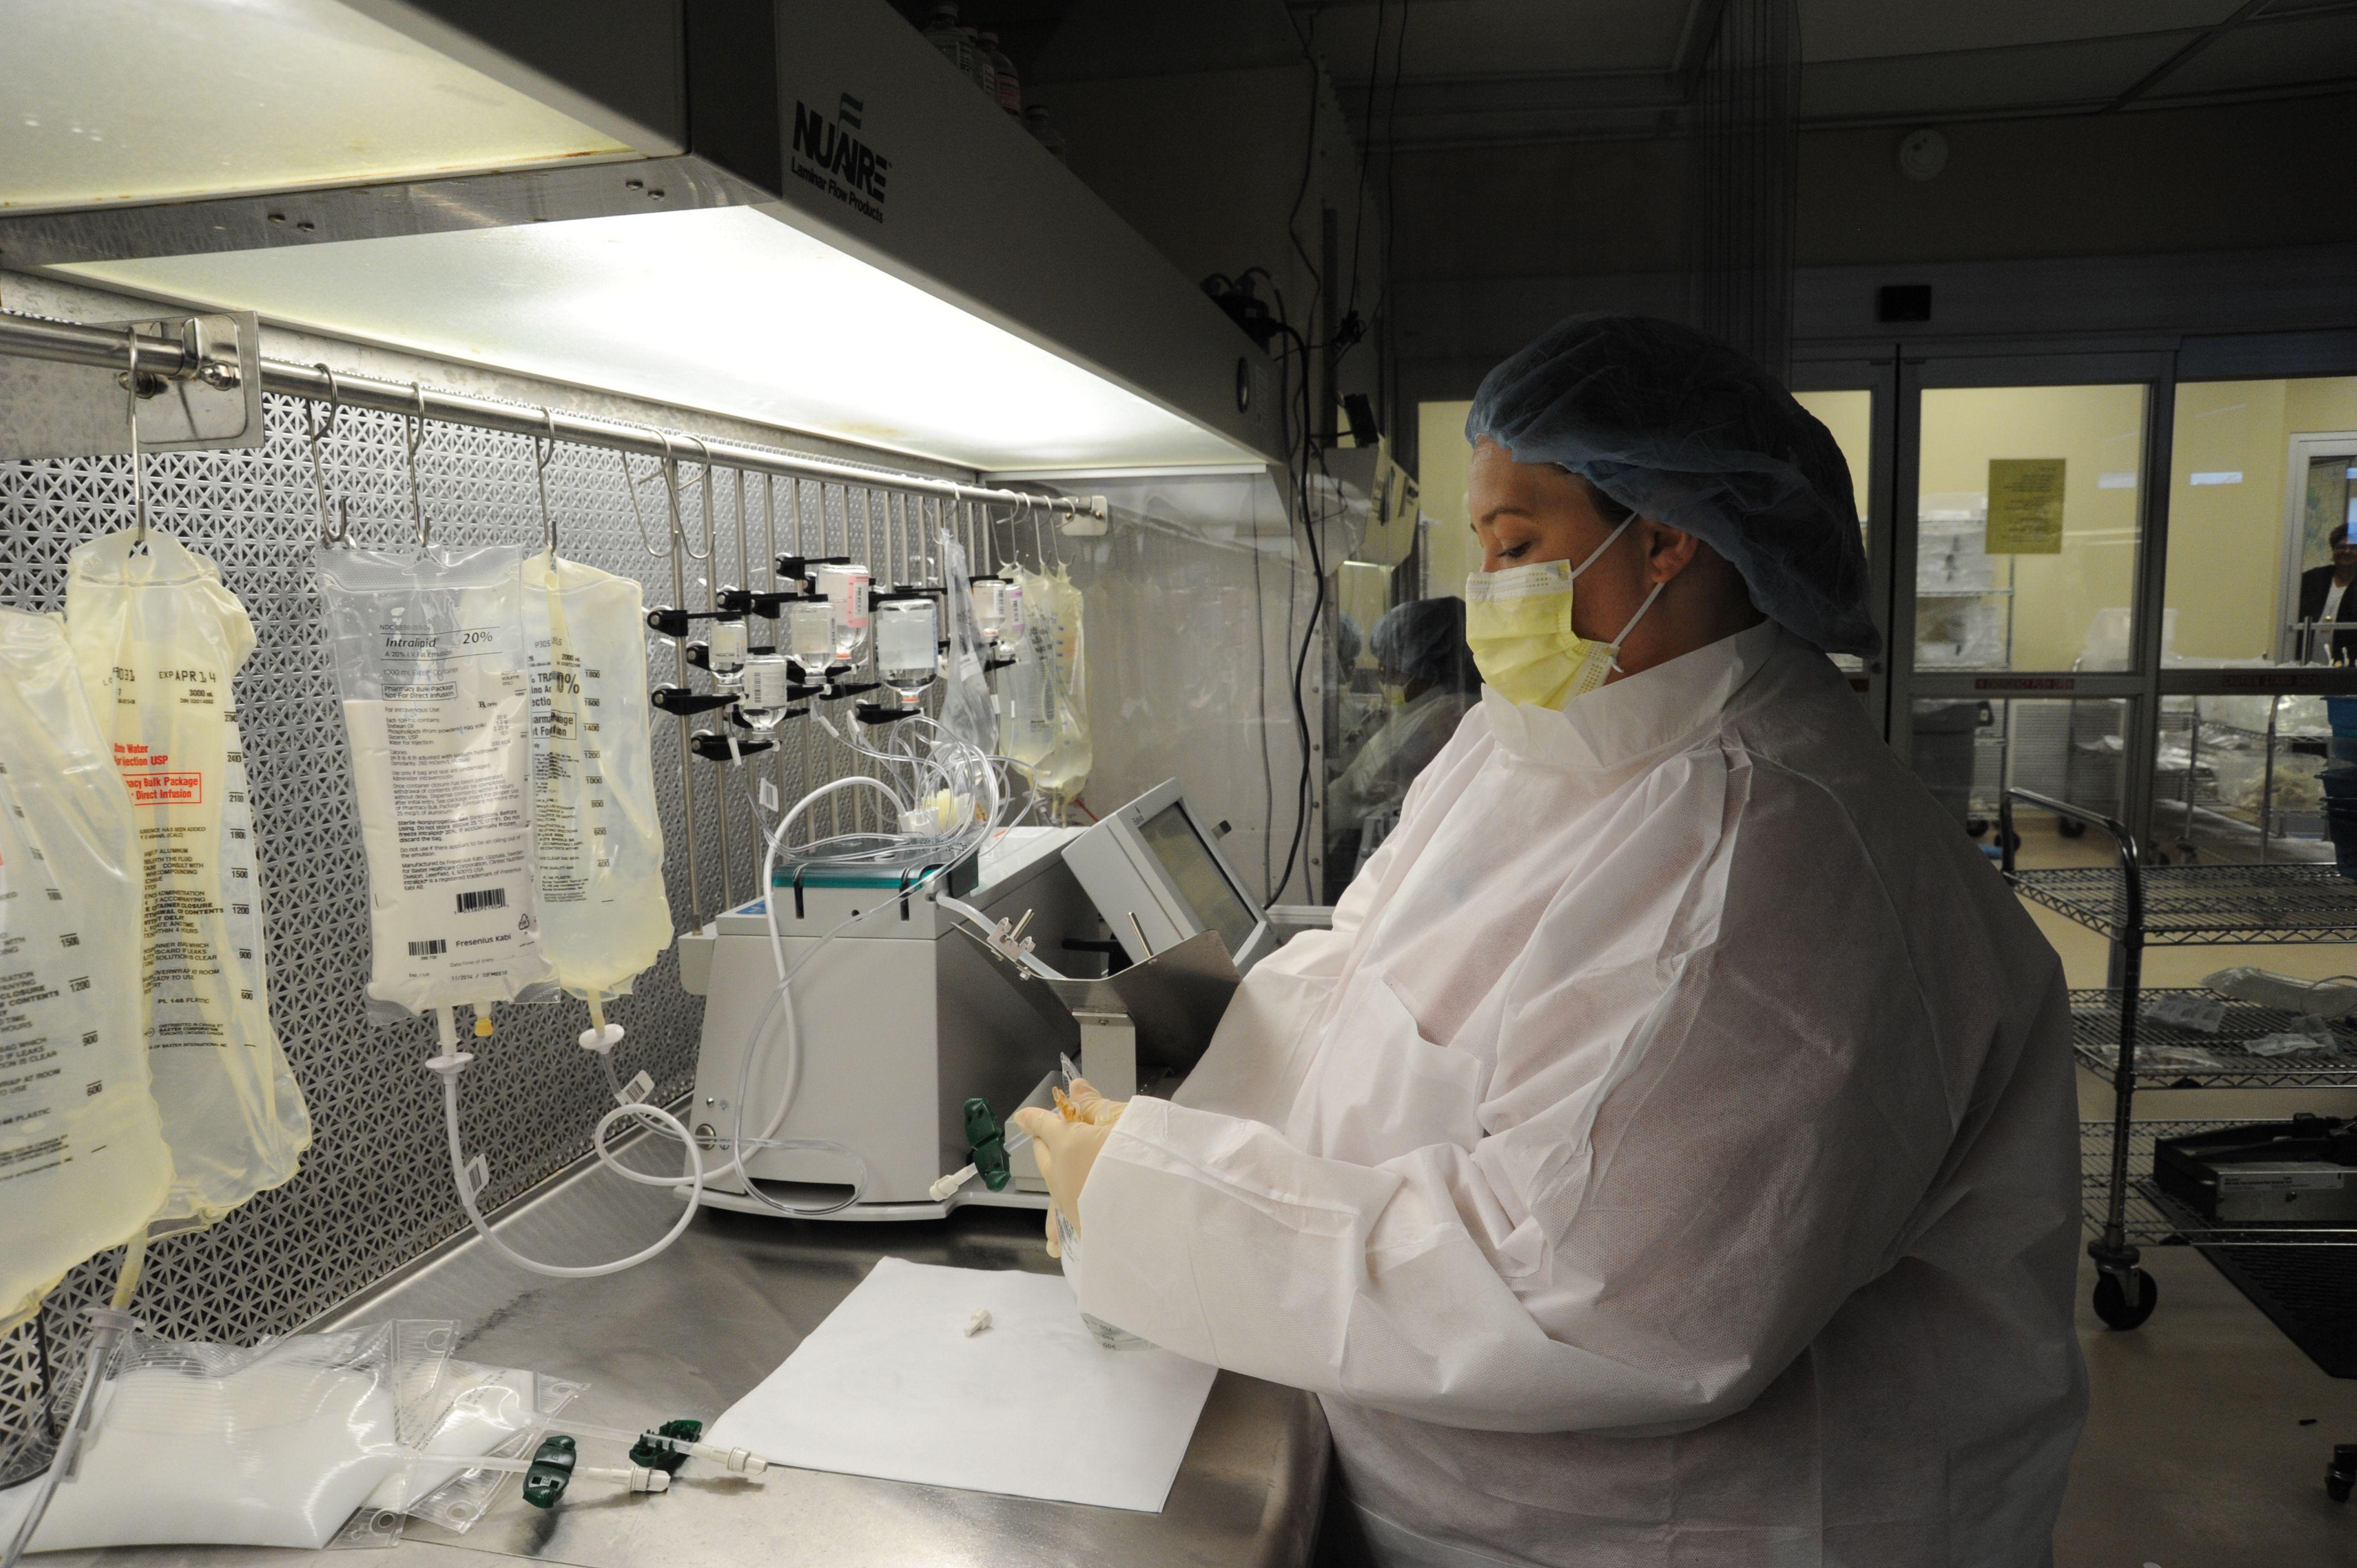 A pharmacy technician mixes and prepares medicine for